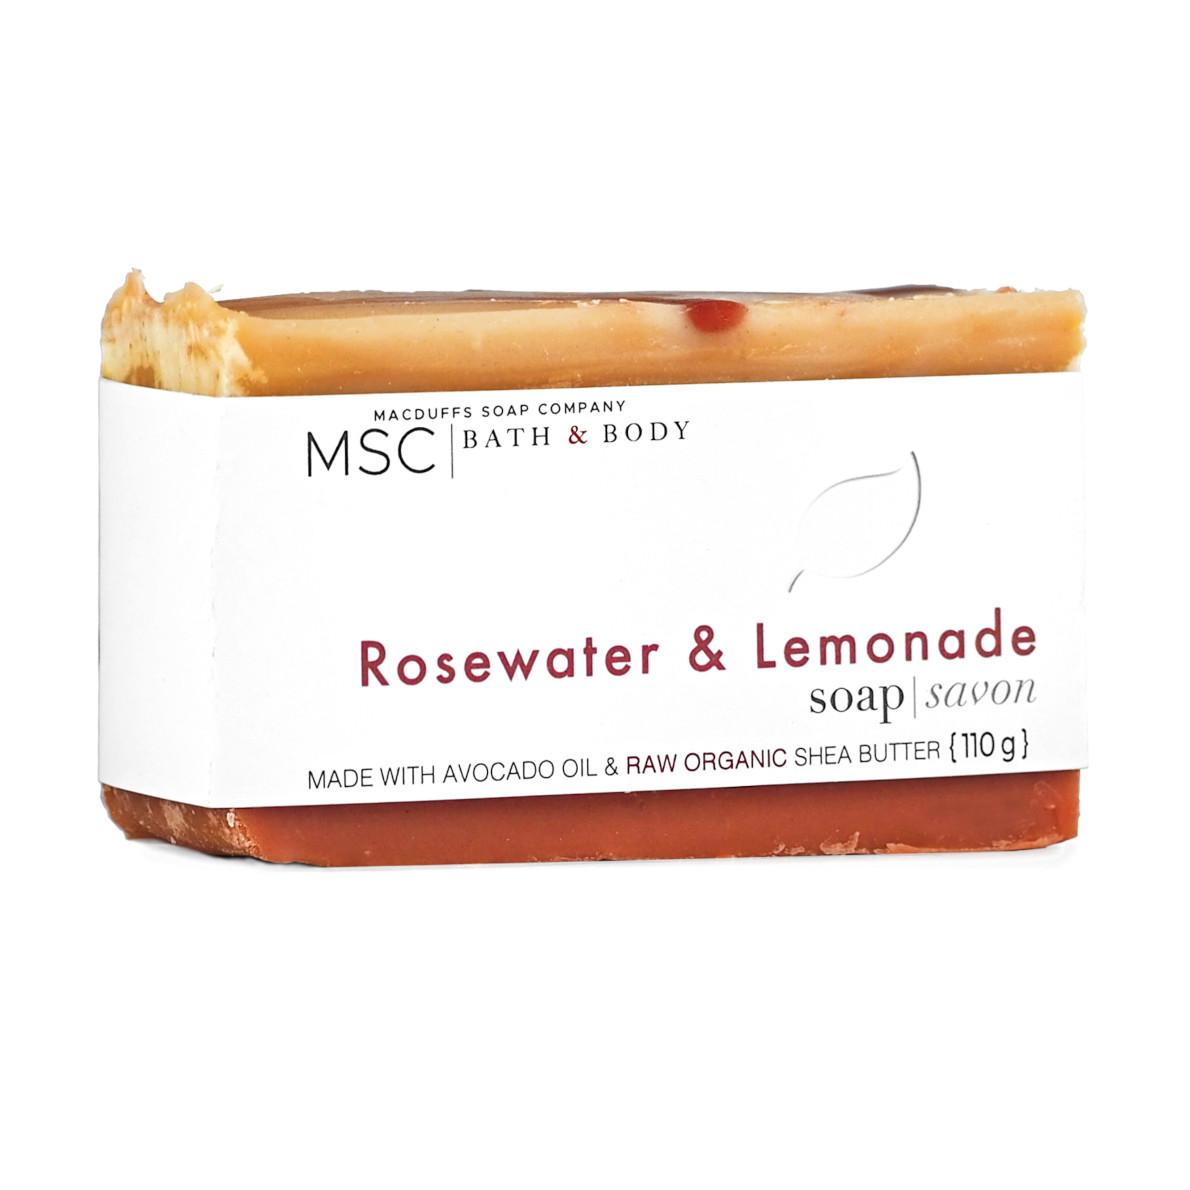 Rosewater & Lemonade Bar Soap